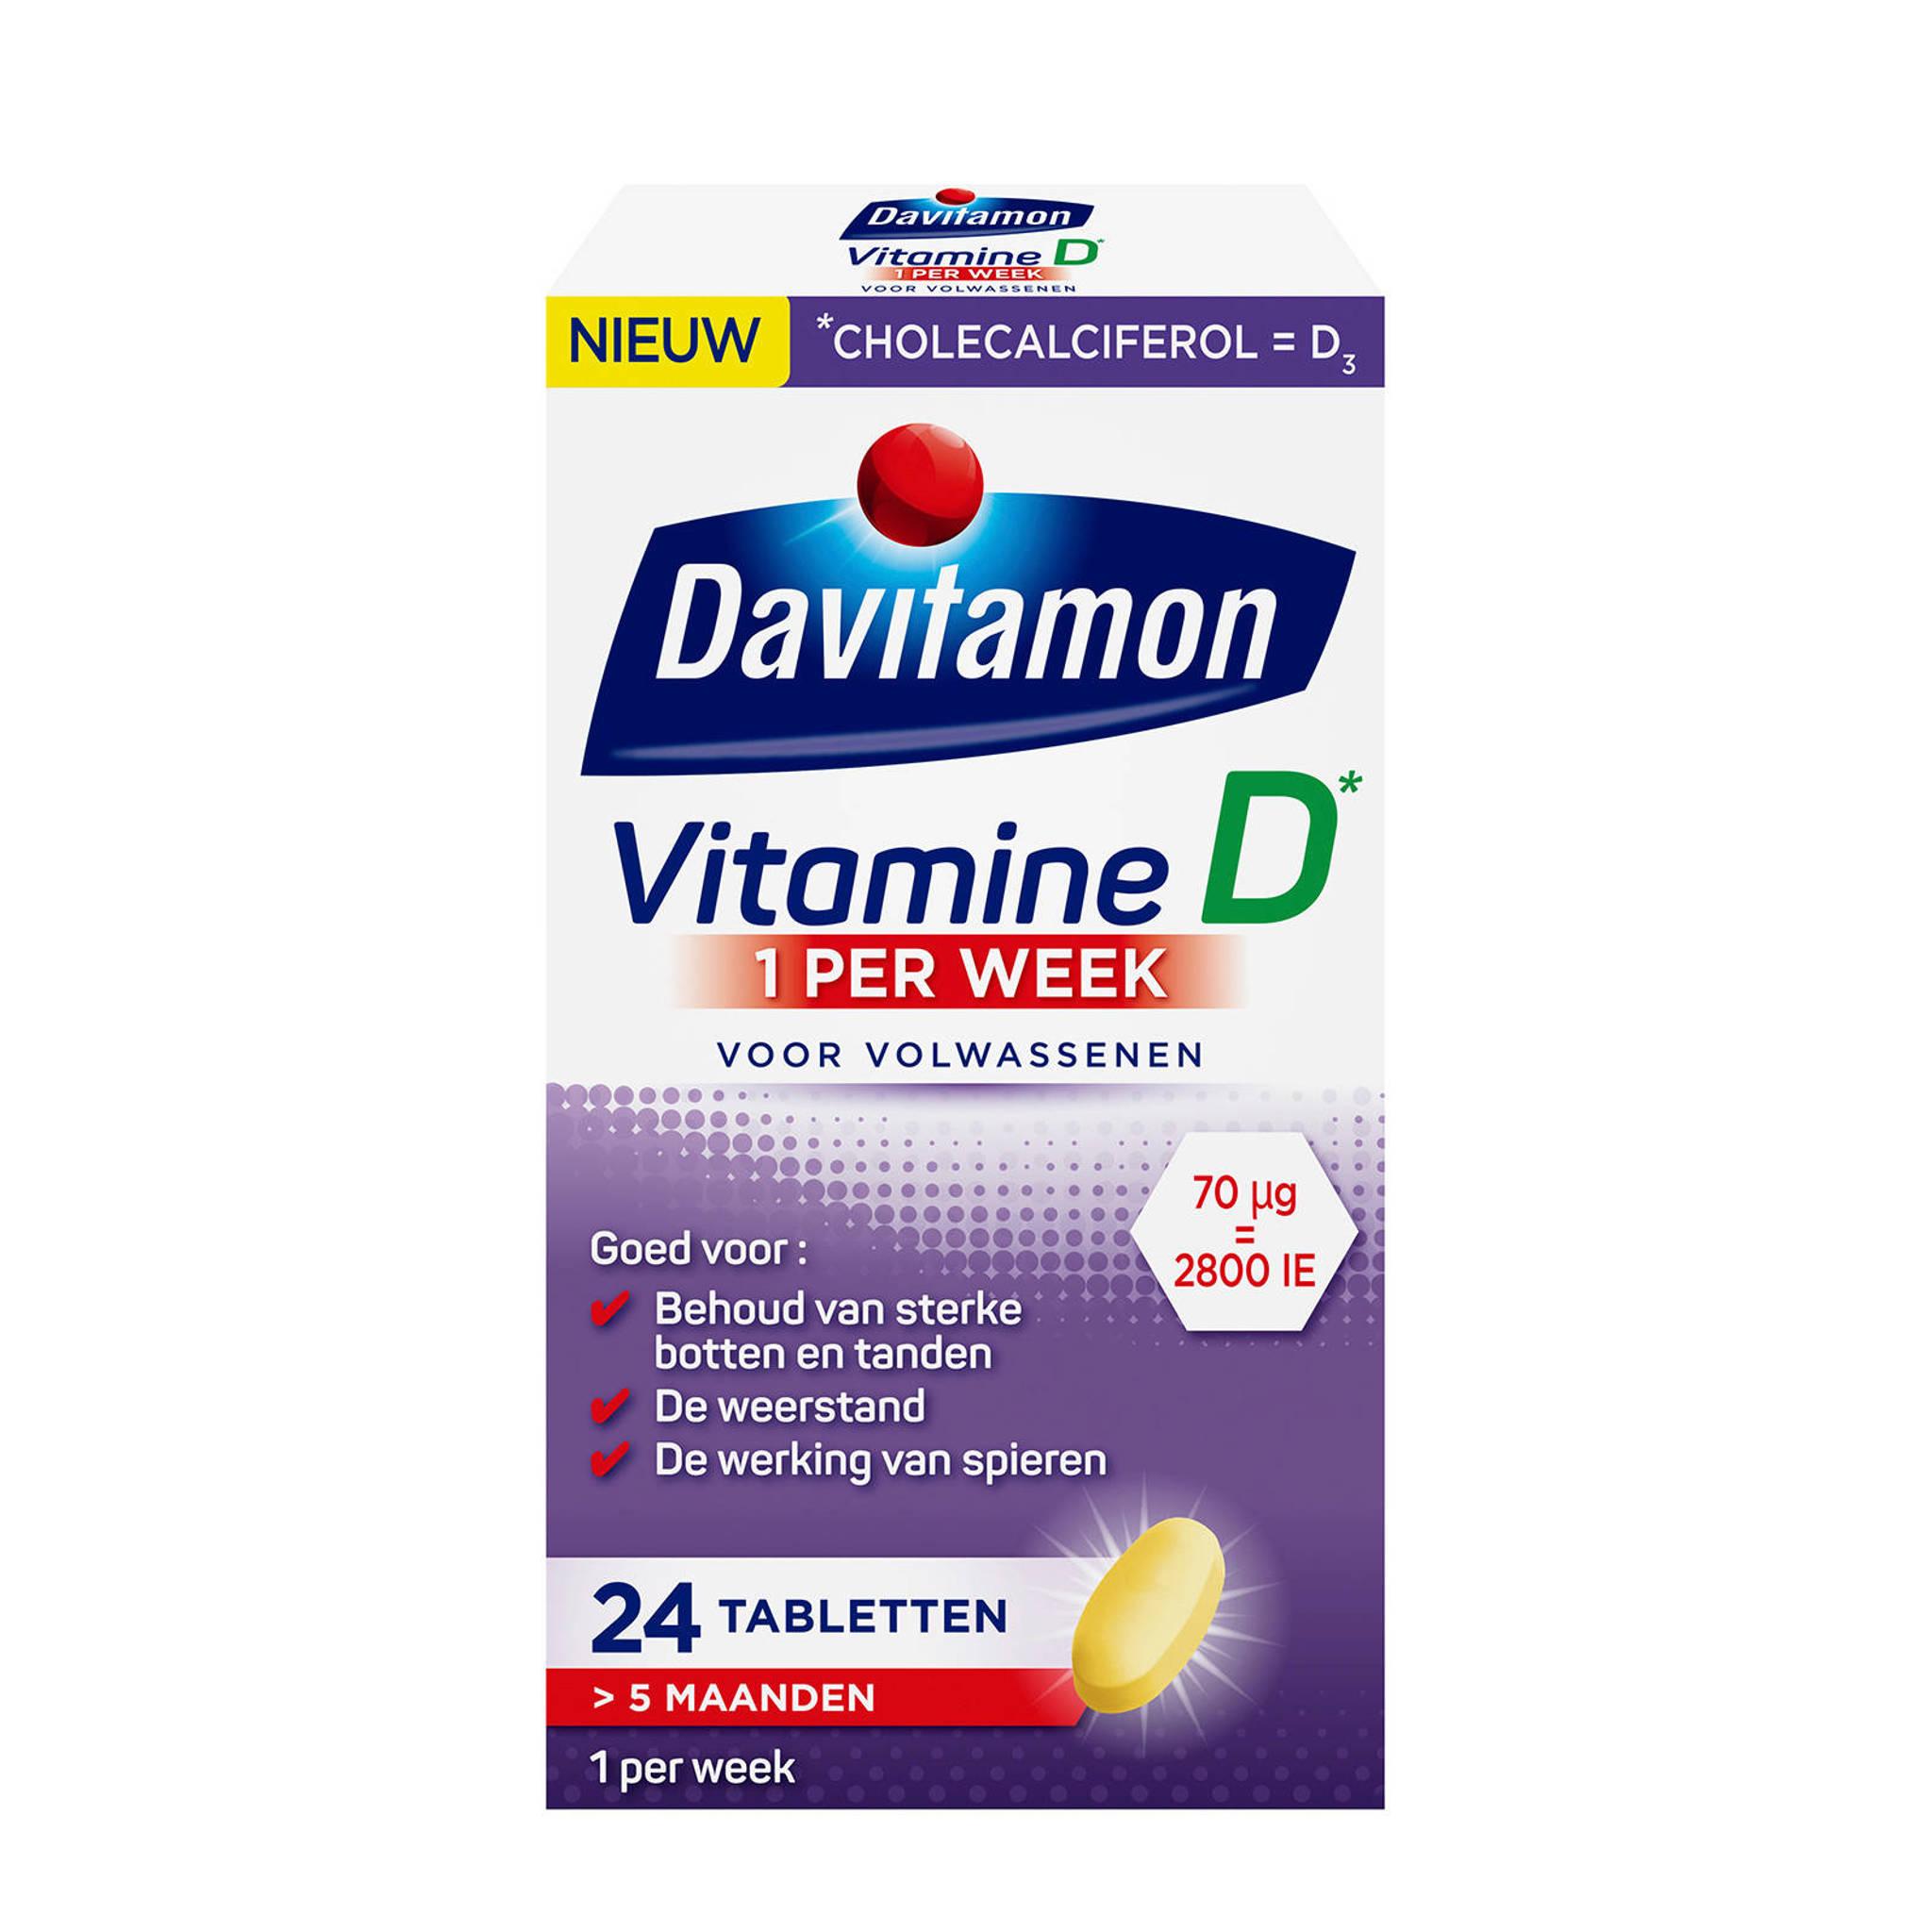 Davitamon Vitamine D 1 Per Week Wehkamp